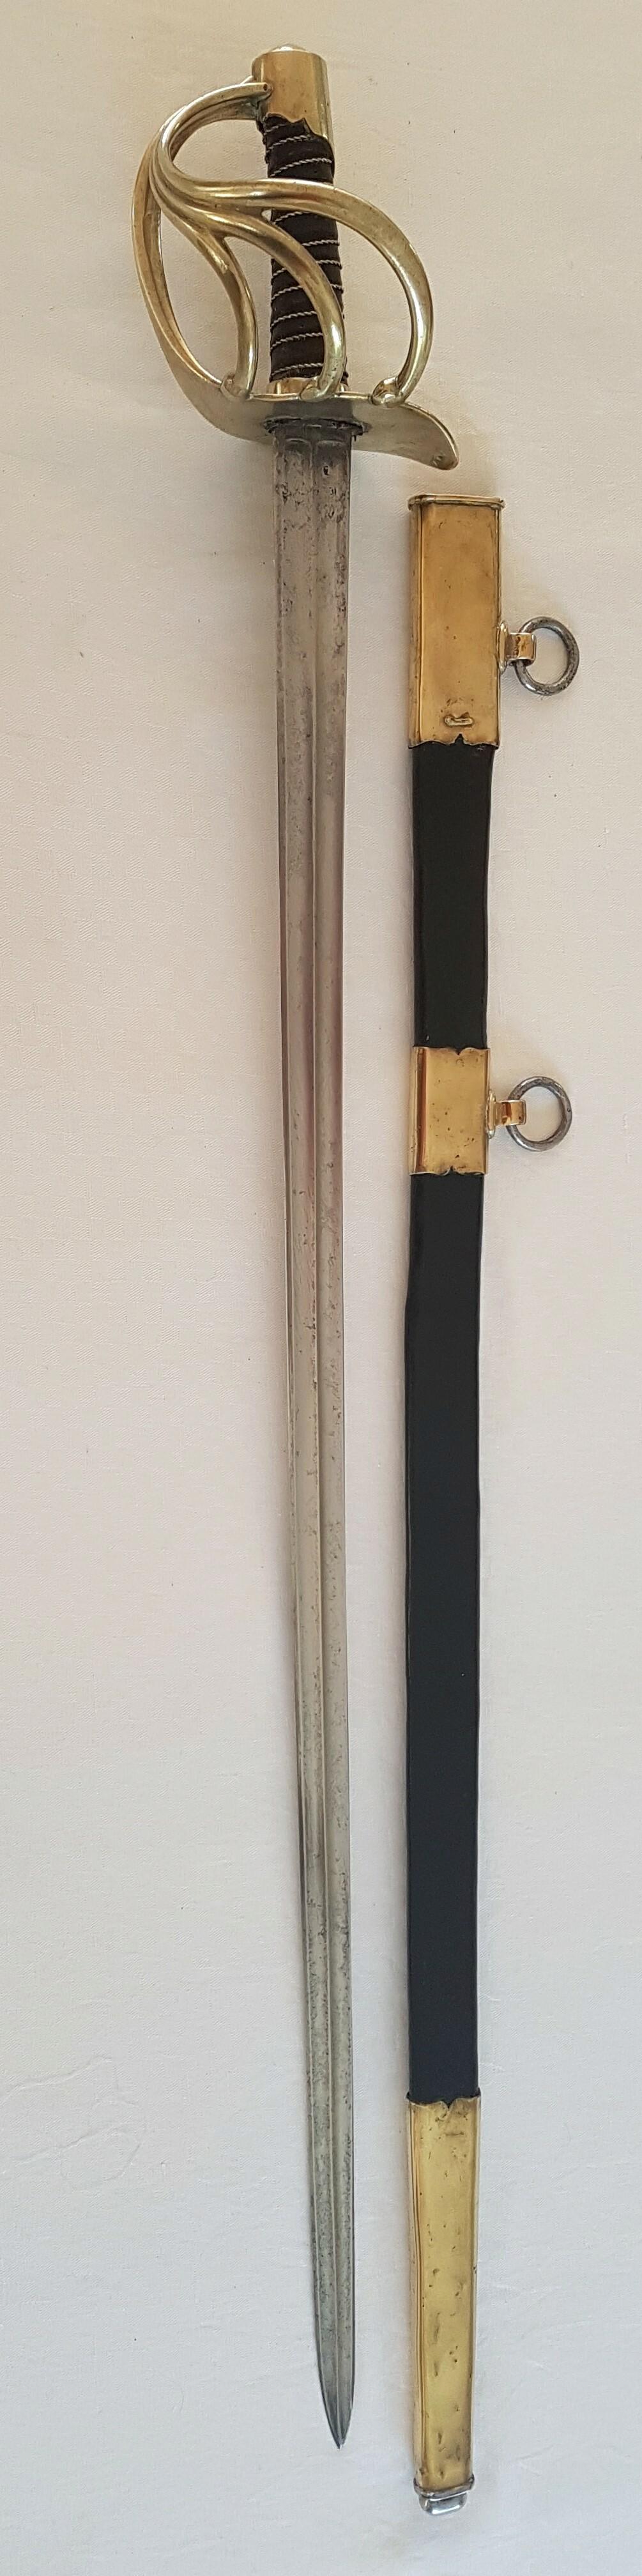 Identification sabre dragon 1812 1020